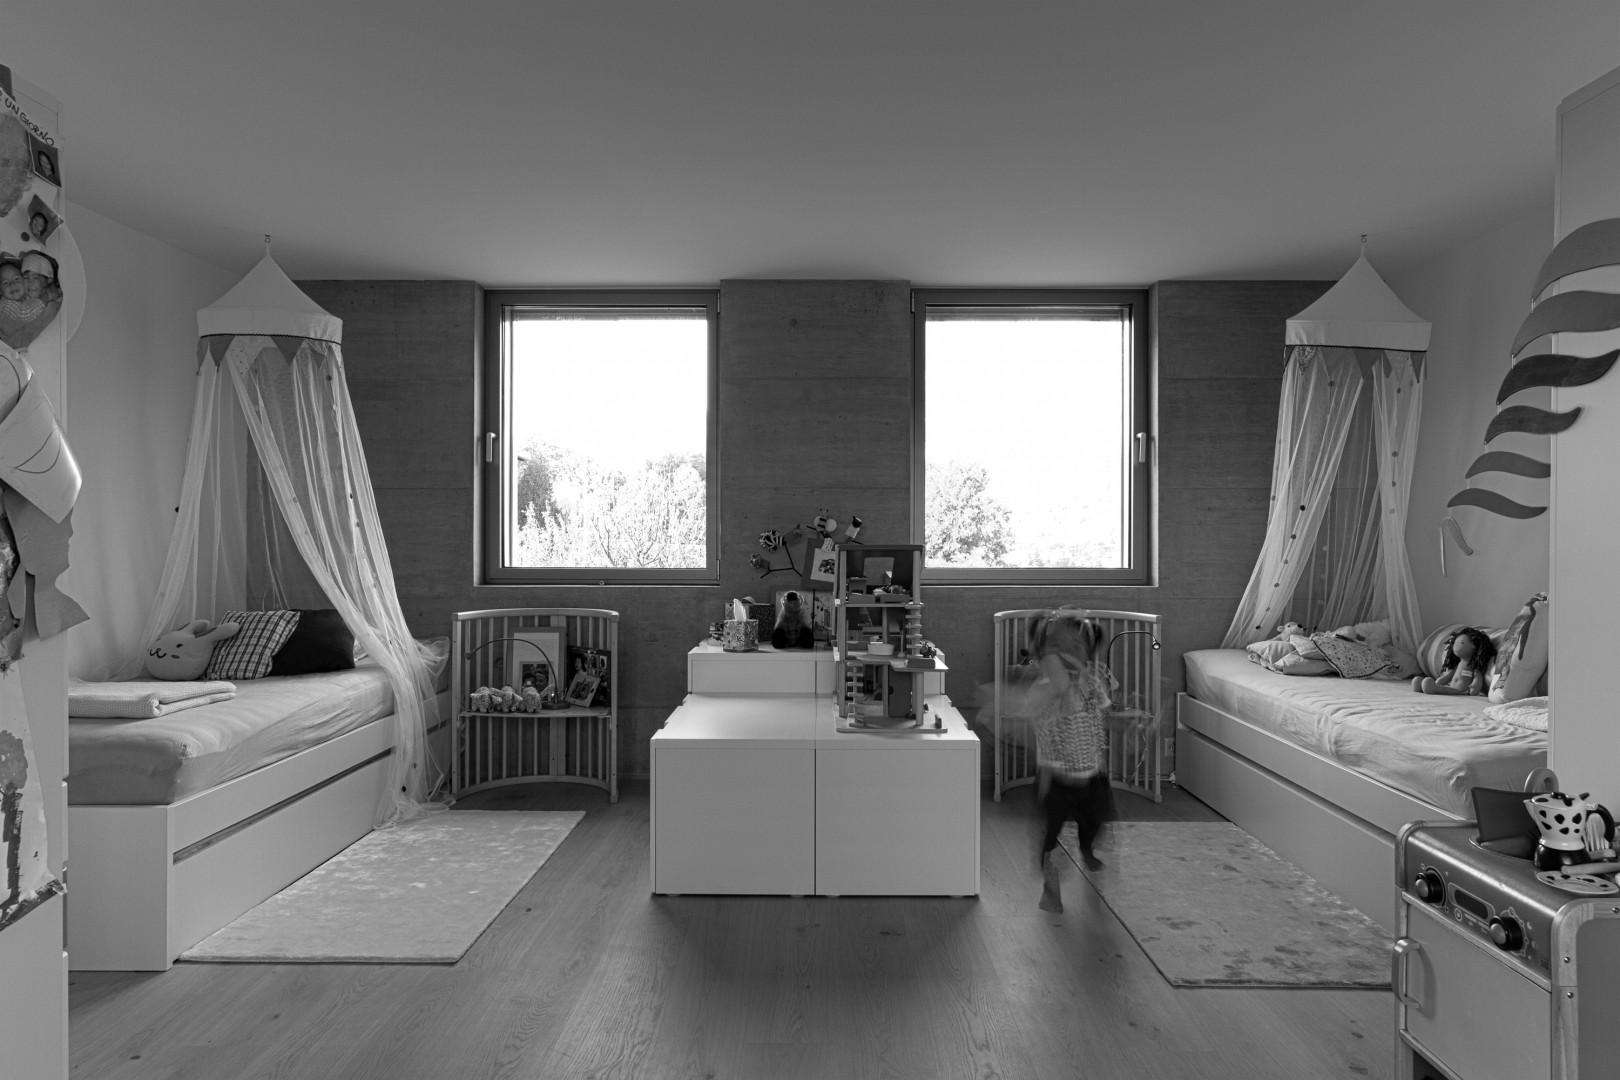 Kinderzimmer © Simone Bossi